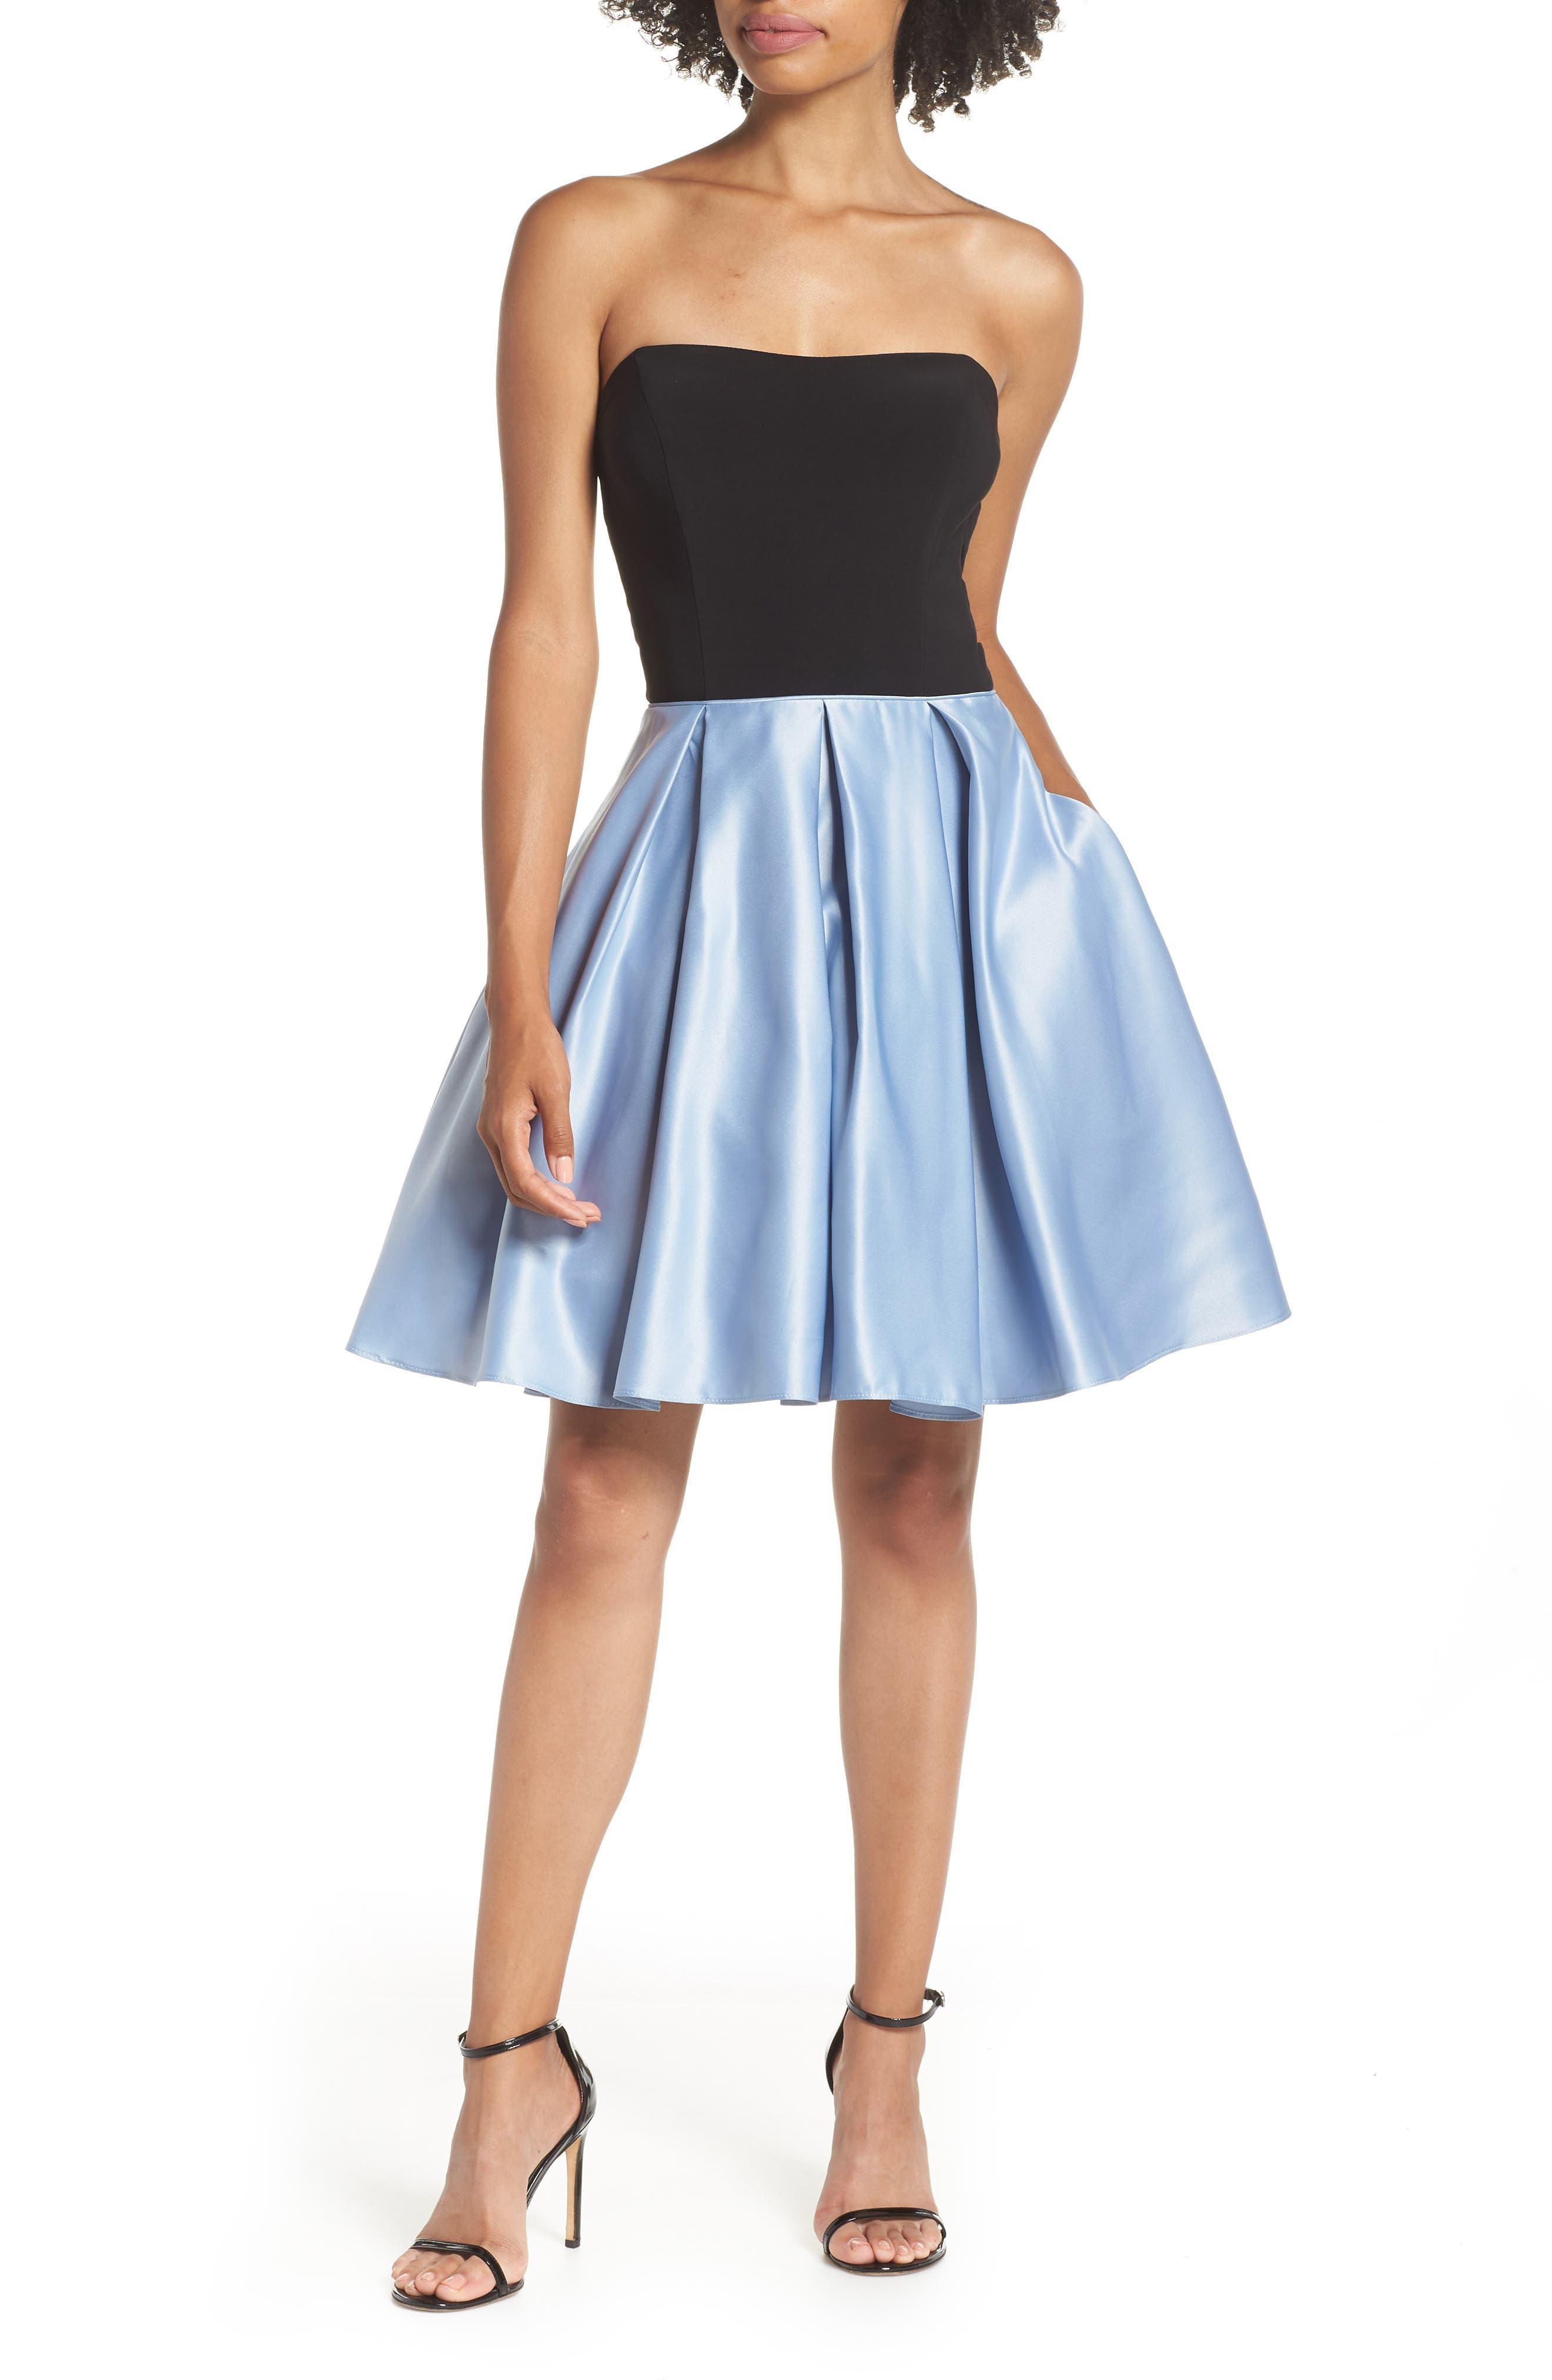 Blondie Nites Strapless Satin Skirt Fit & Flare Dress, Blue